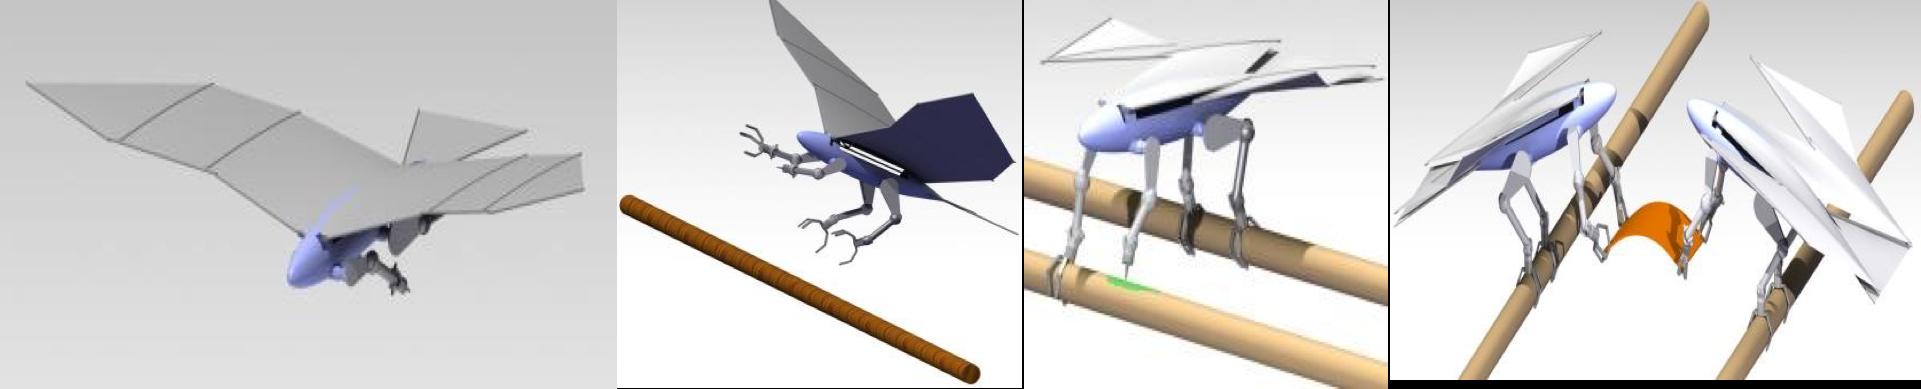 aerial-robots